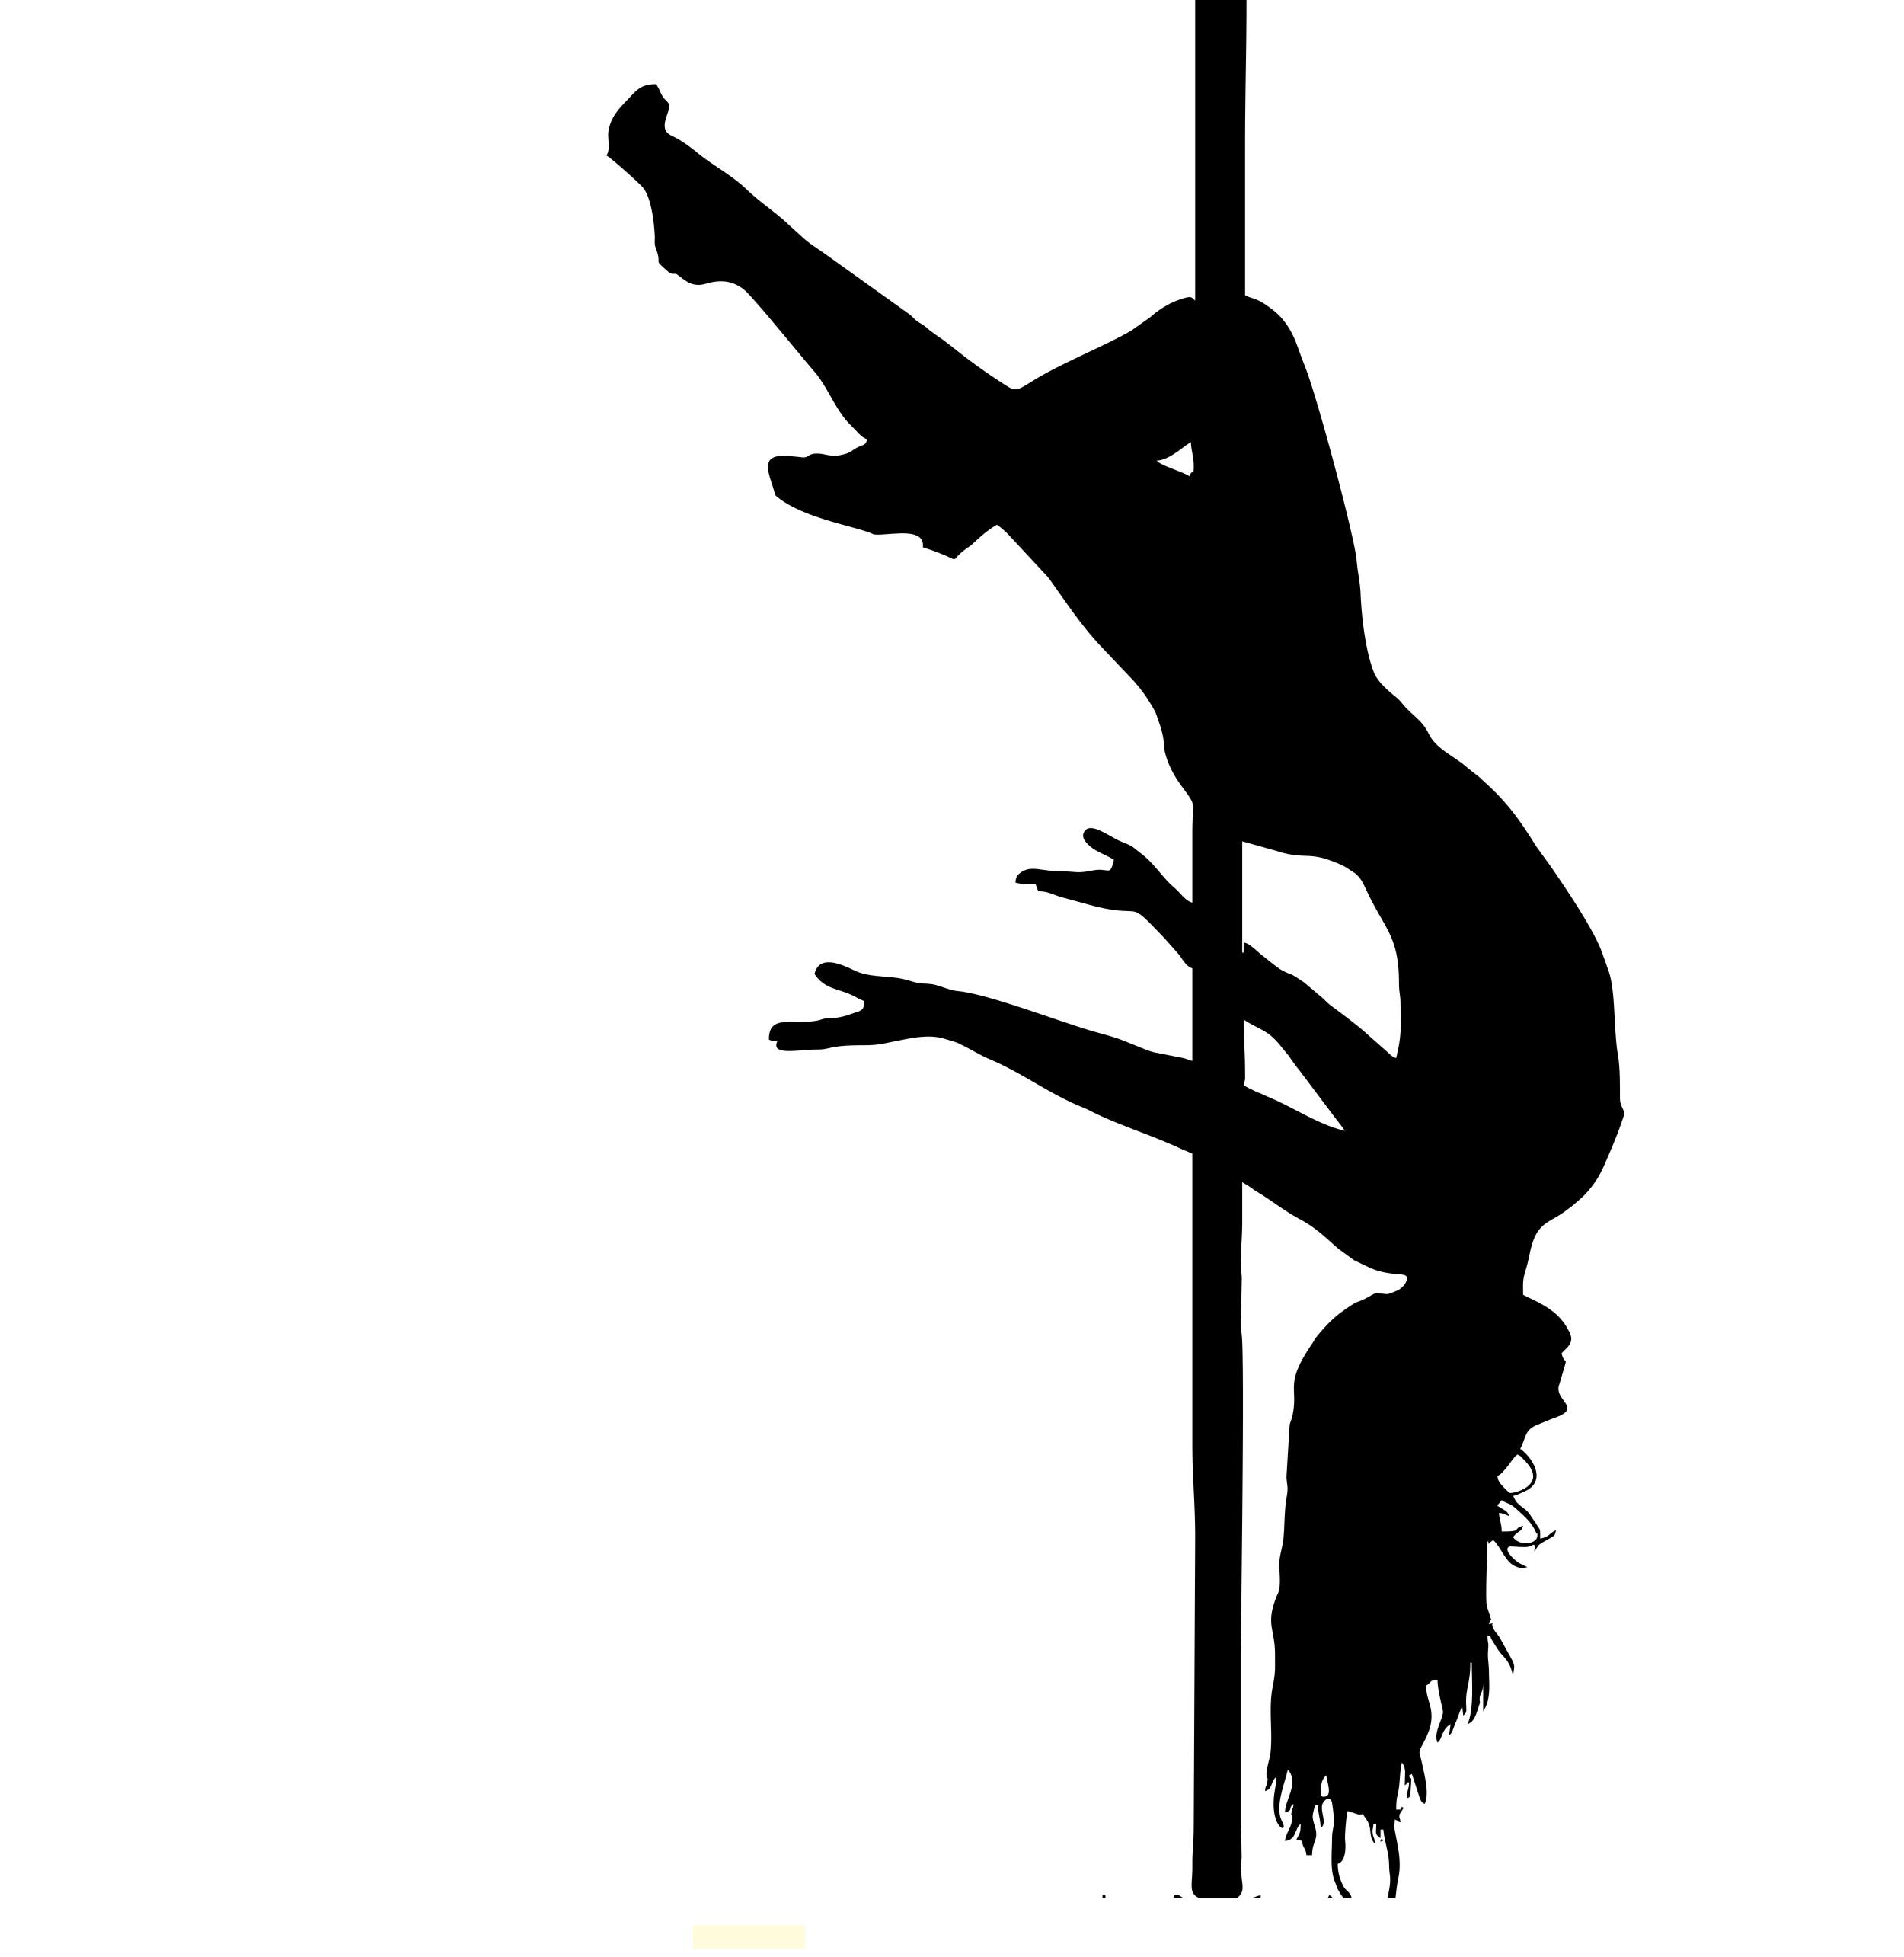 pole dance image